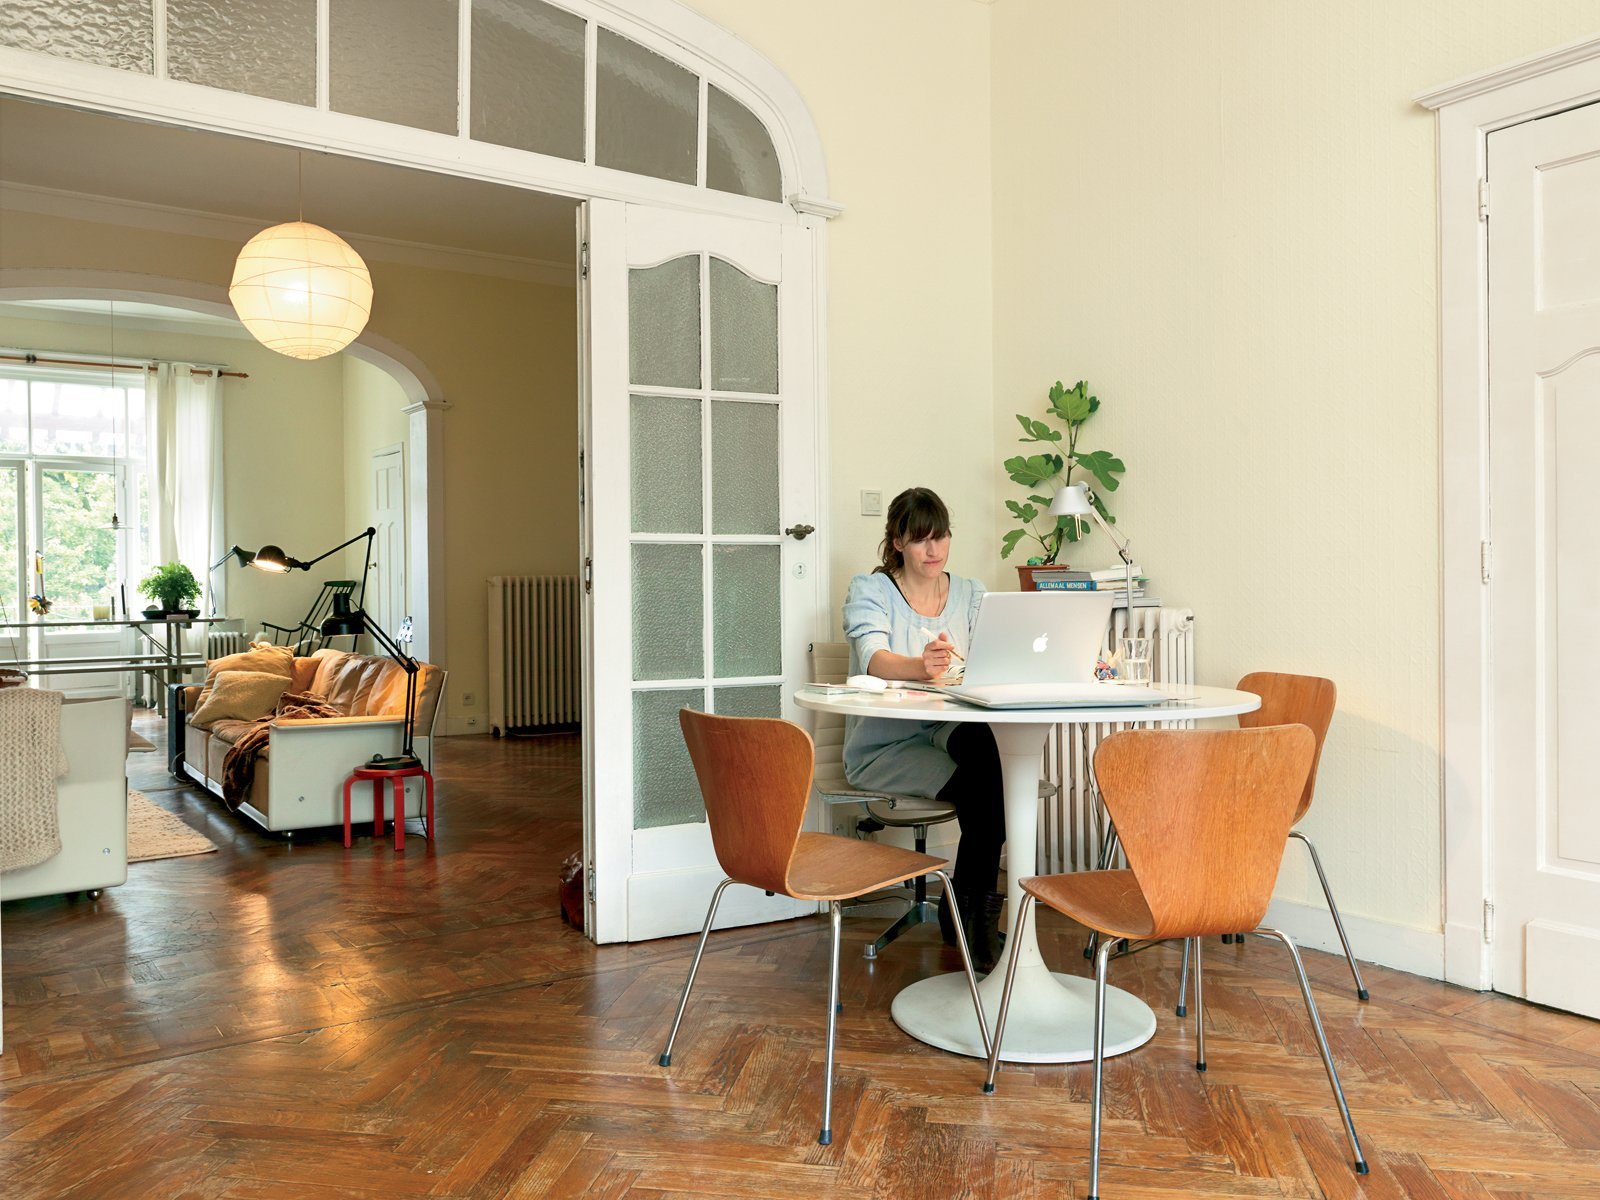 Dining Room, Table, Chair, and Medium Hardwood Floor Designer Christiane Hogner, Bruxelles  Photo 4 of 15 in Kind of New